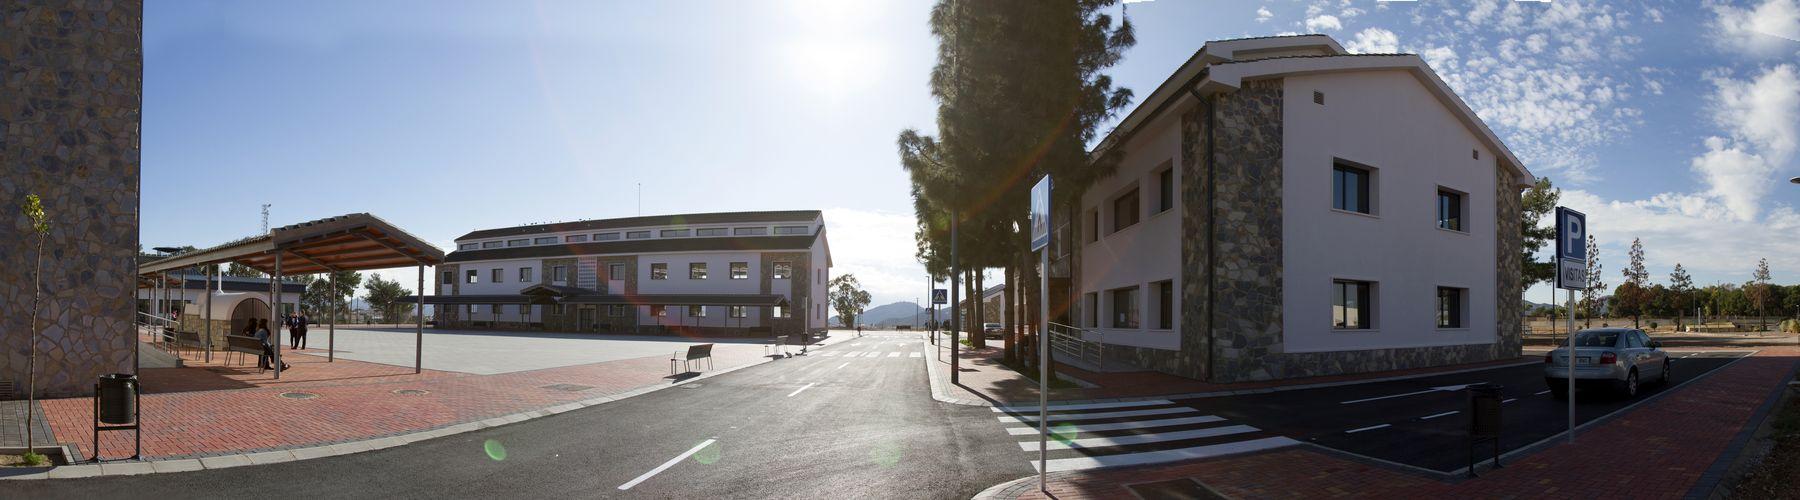 campus-cartagena2.jpg